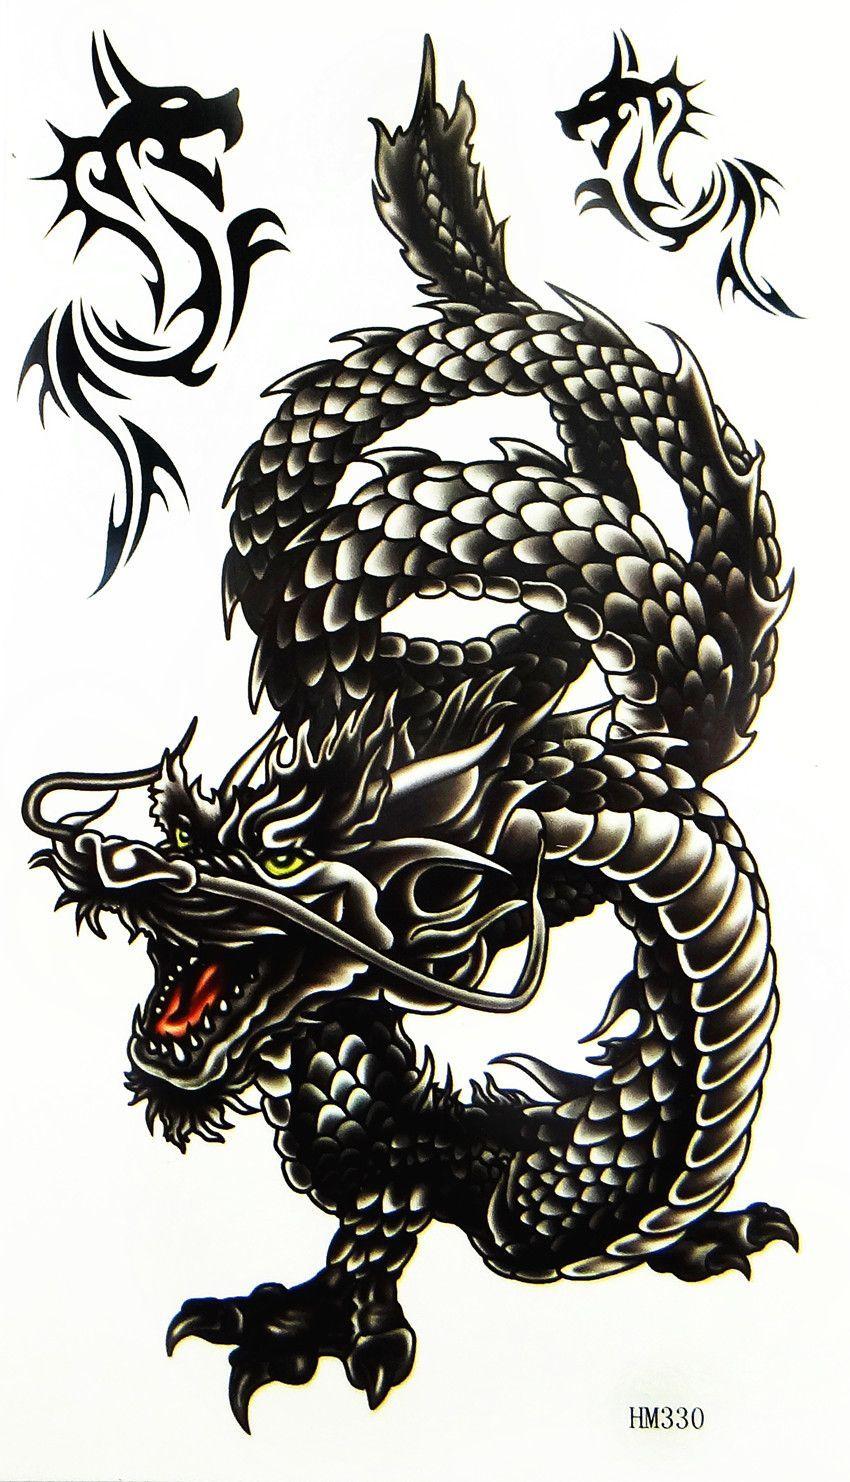 Great 50 Dragon Tattoos Designs Ideas Black Ink Oriental Dragon Tattoo Designs Awesometattooid Dragon Tattoo Designs Japanese Dragon Tattoos Dragon Artwork